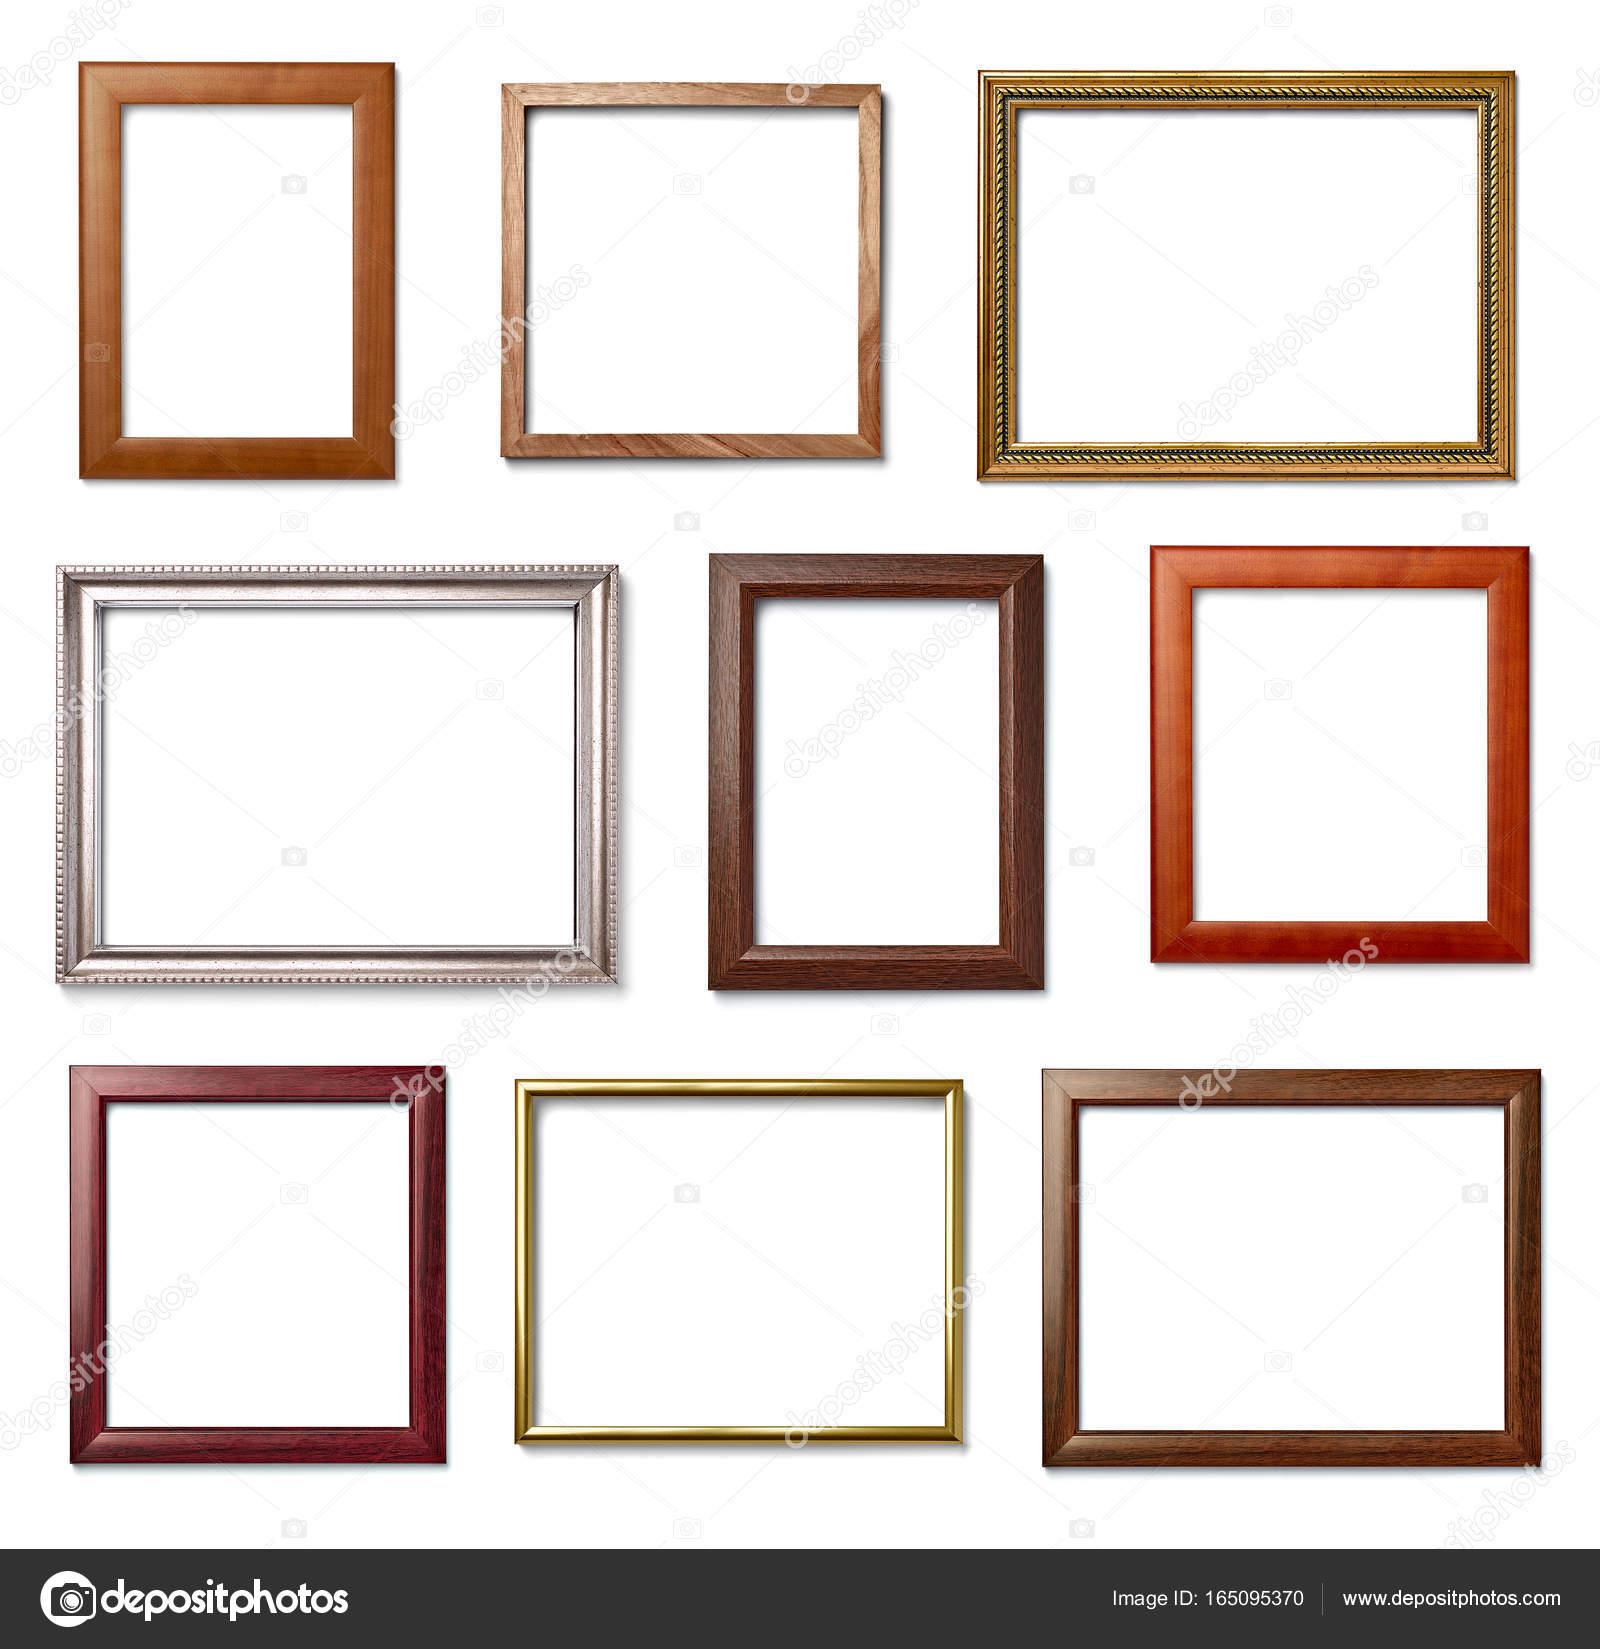 Vintage-Rahmen Holz Hintergrundbild — Stockfoto © PicsFive #165095370